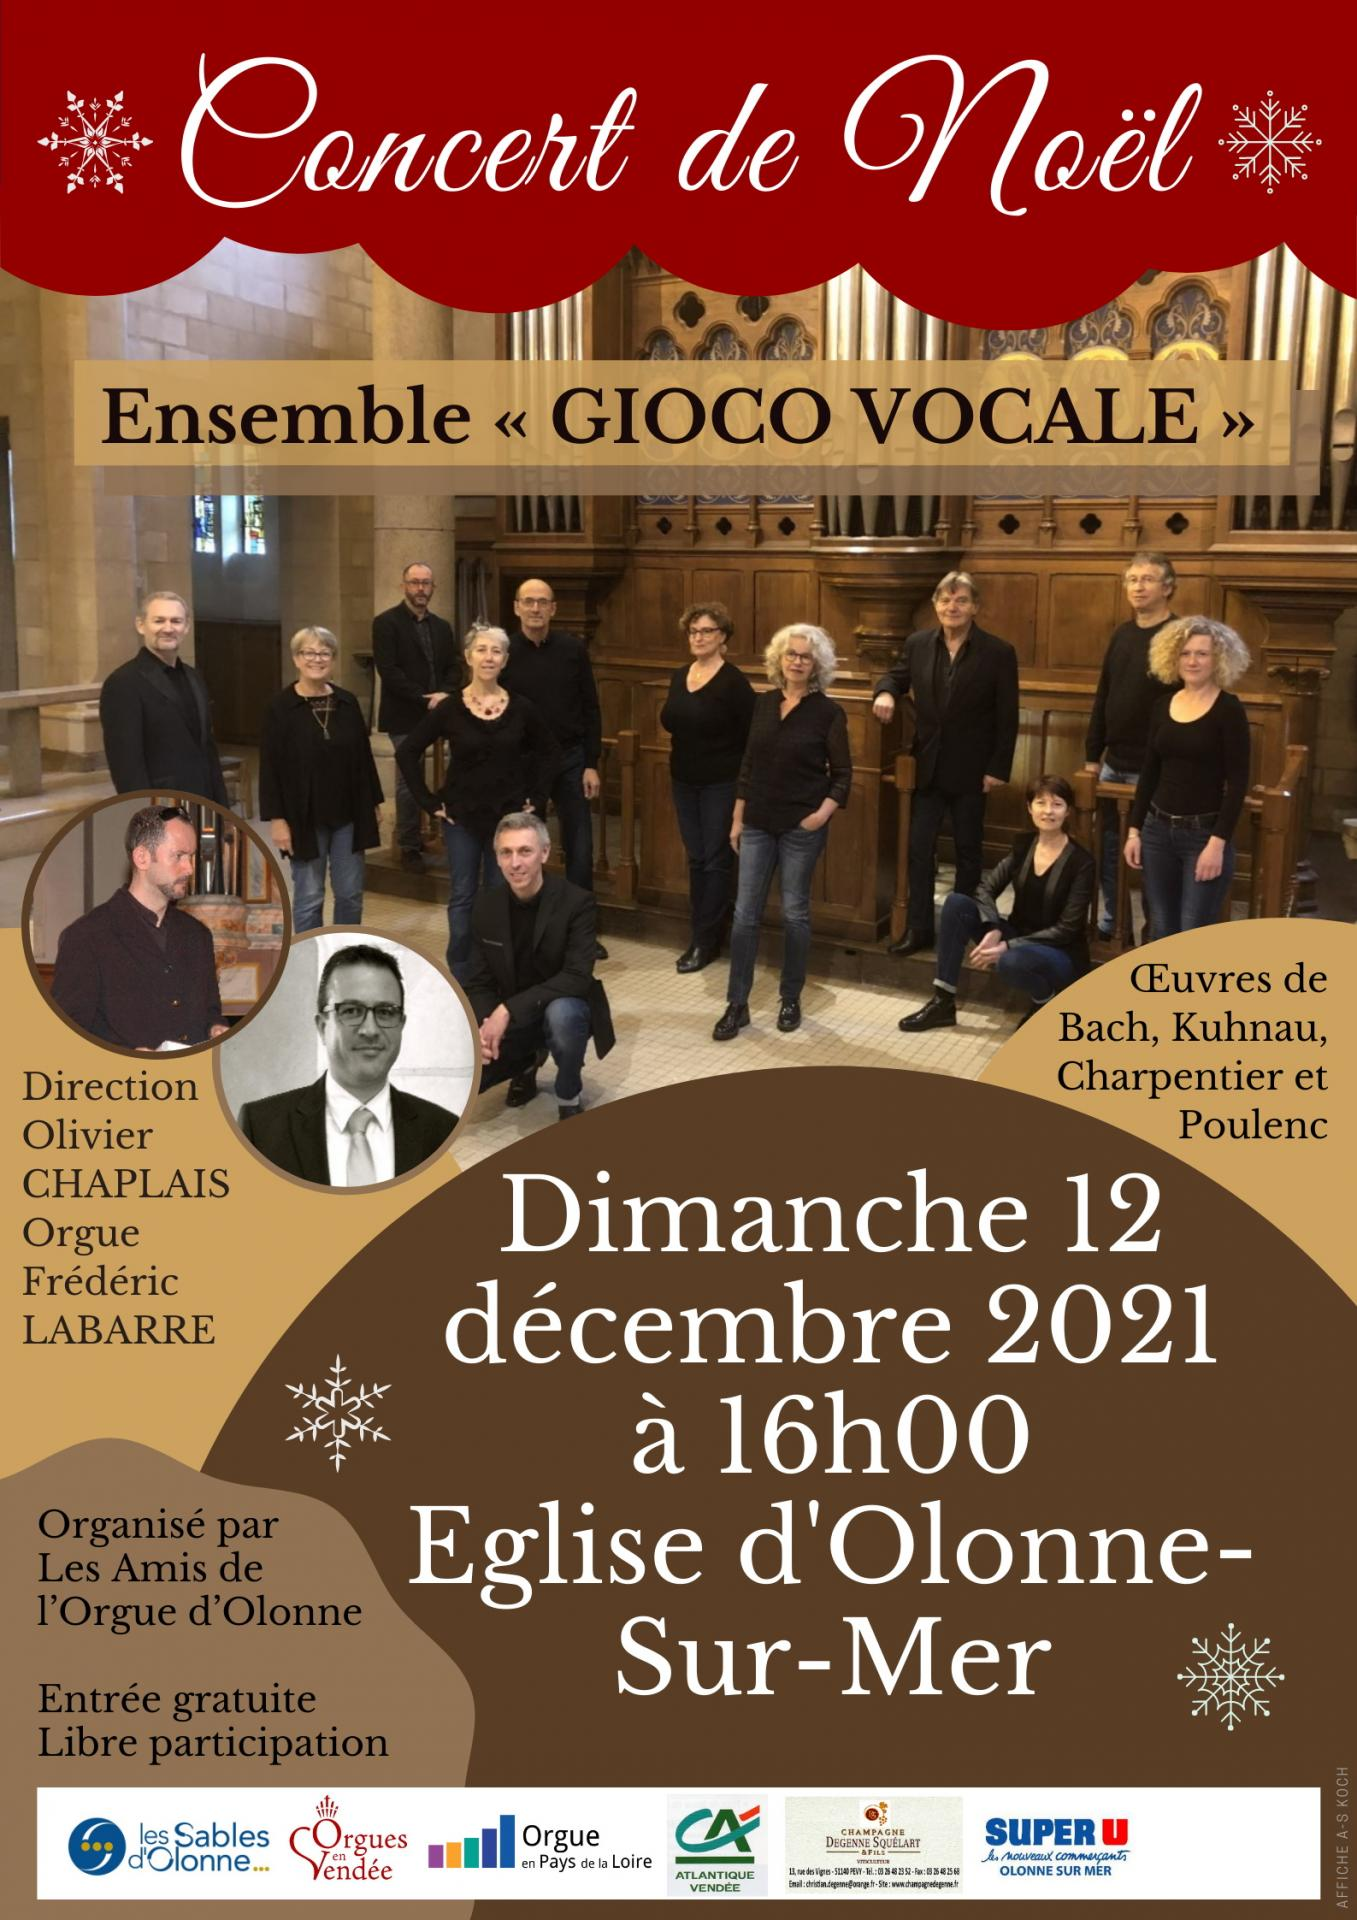 2021 12 12 affiche gioco vocale concert noel